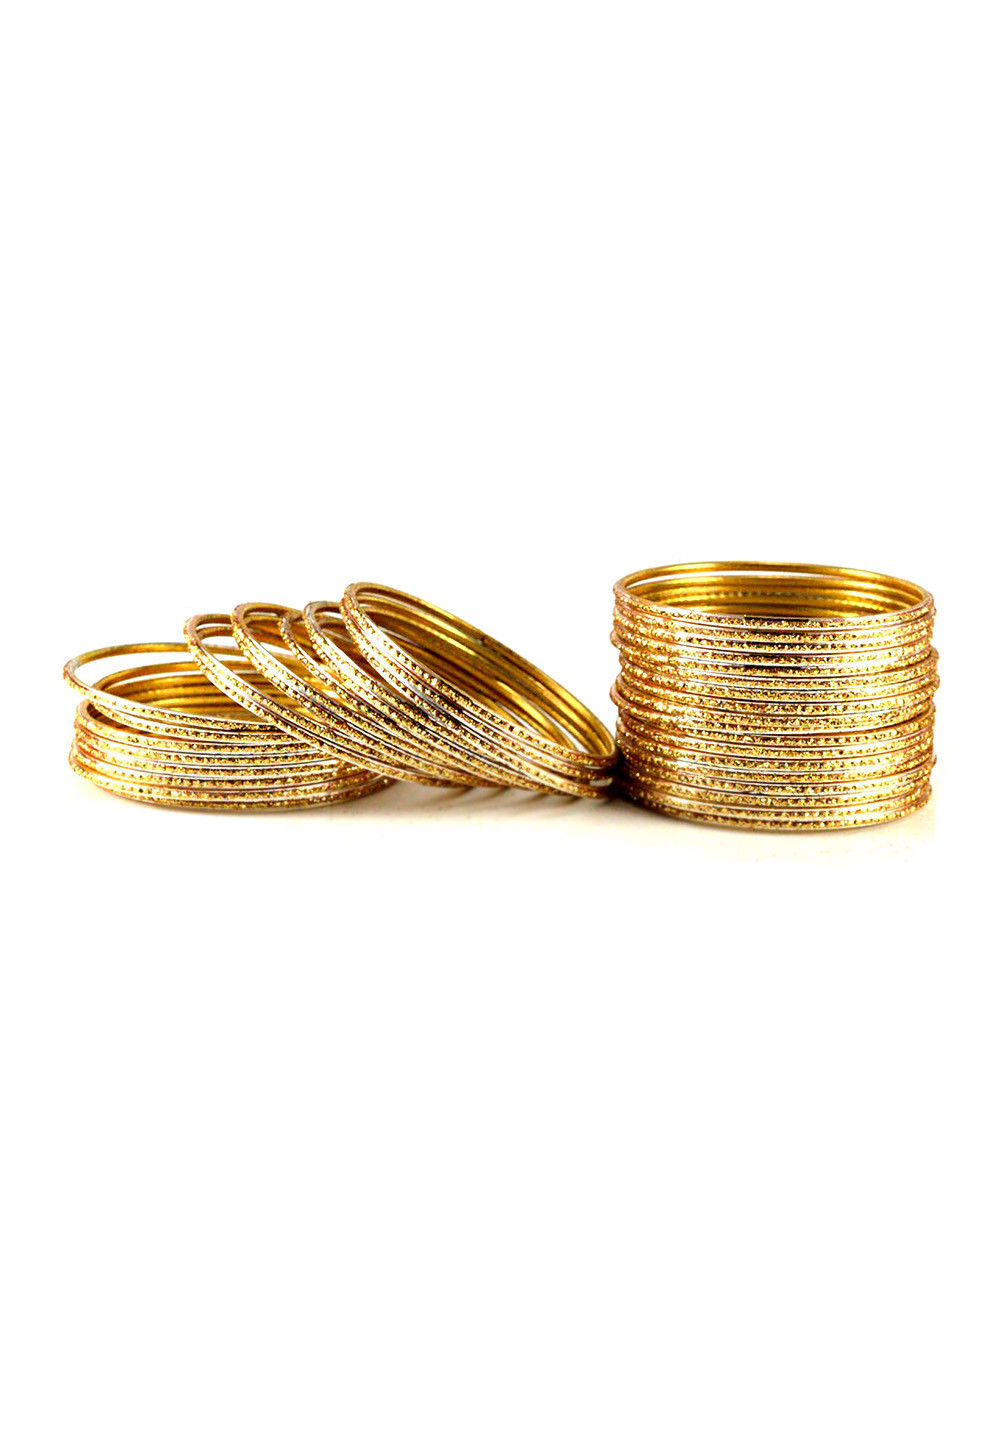 Metallic Bangle Set in Golden